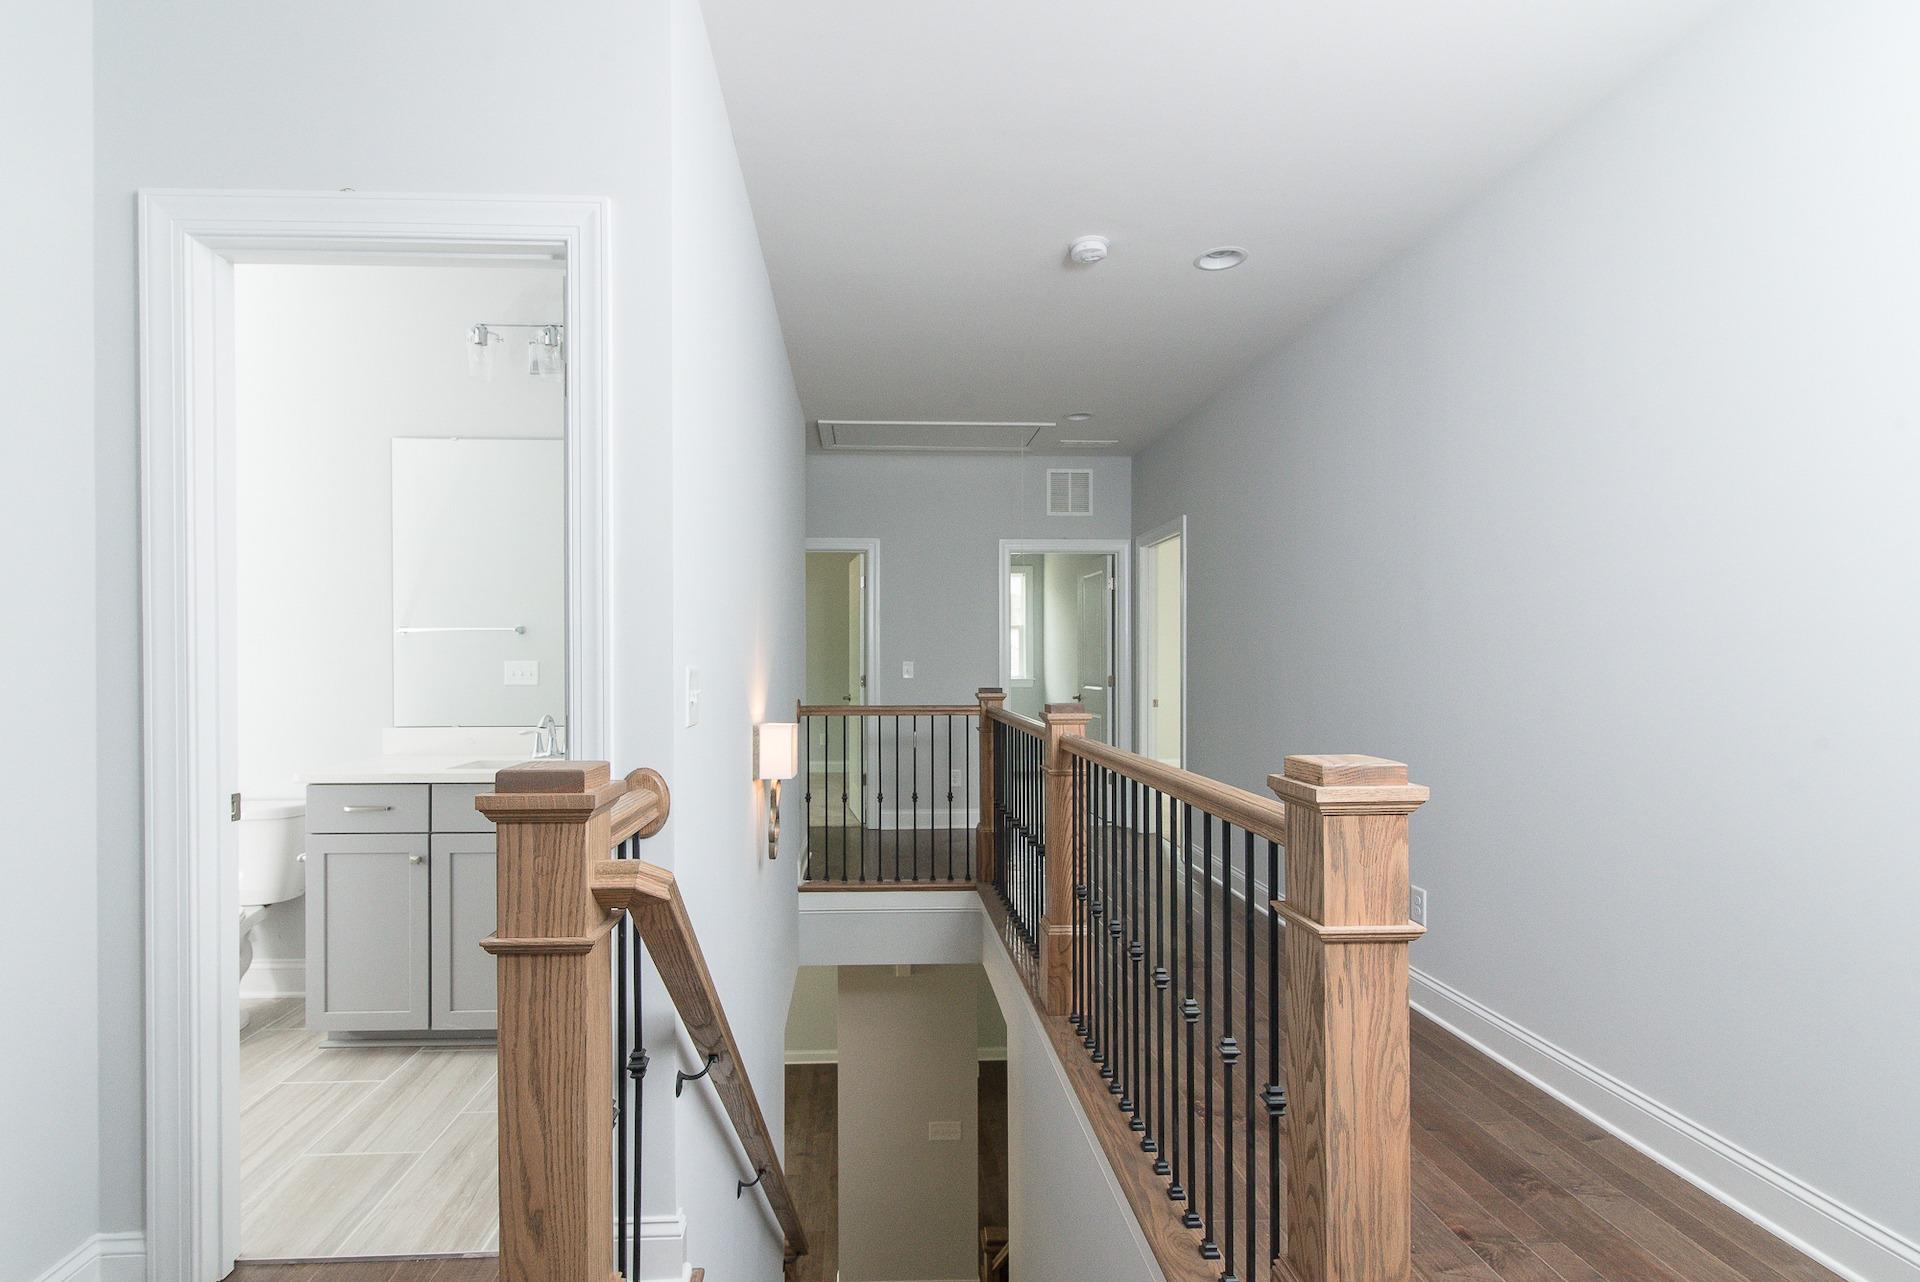 Hornet Homes - Custom Home Builders in Charlotte, NC